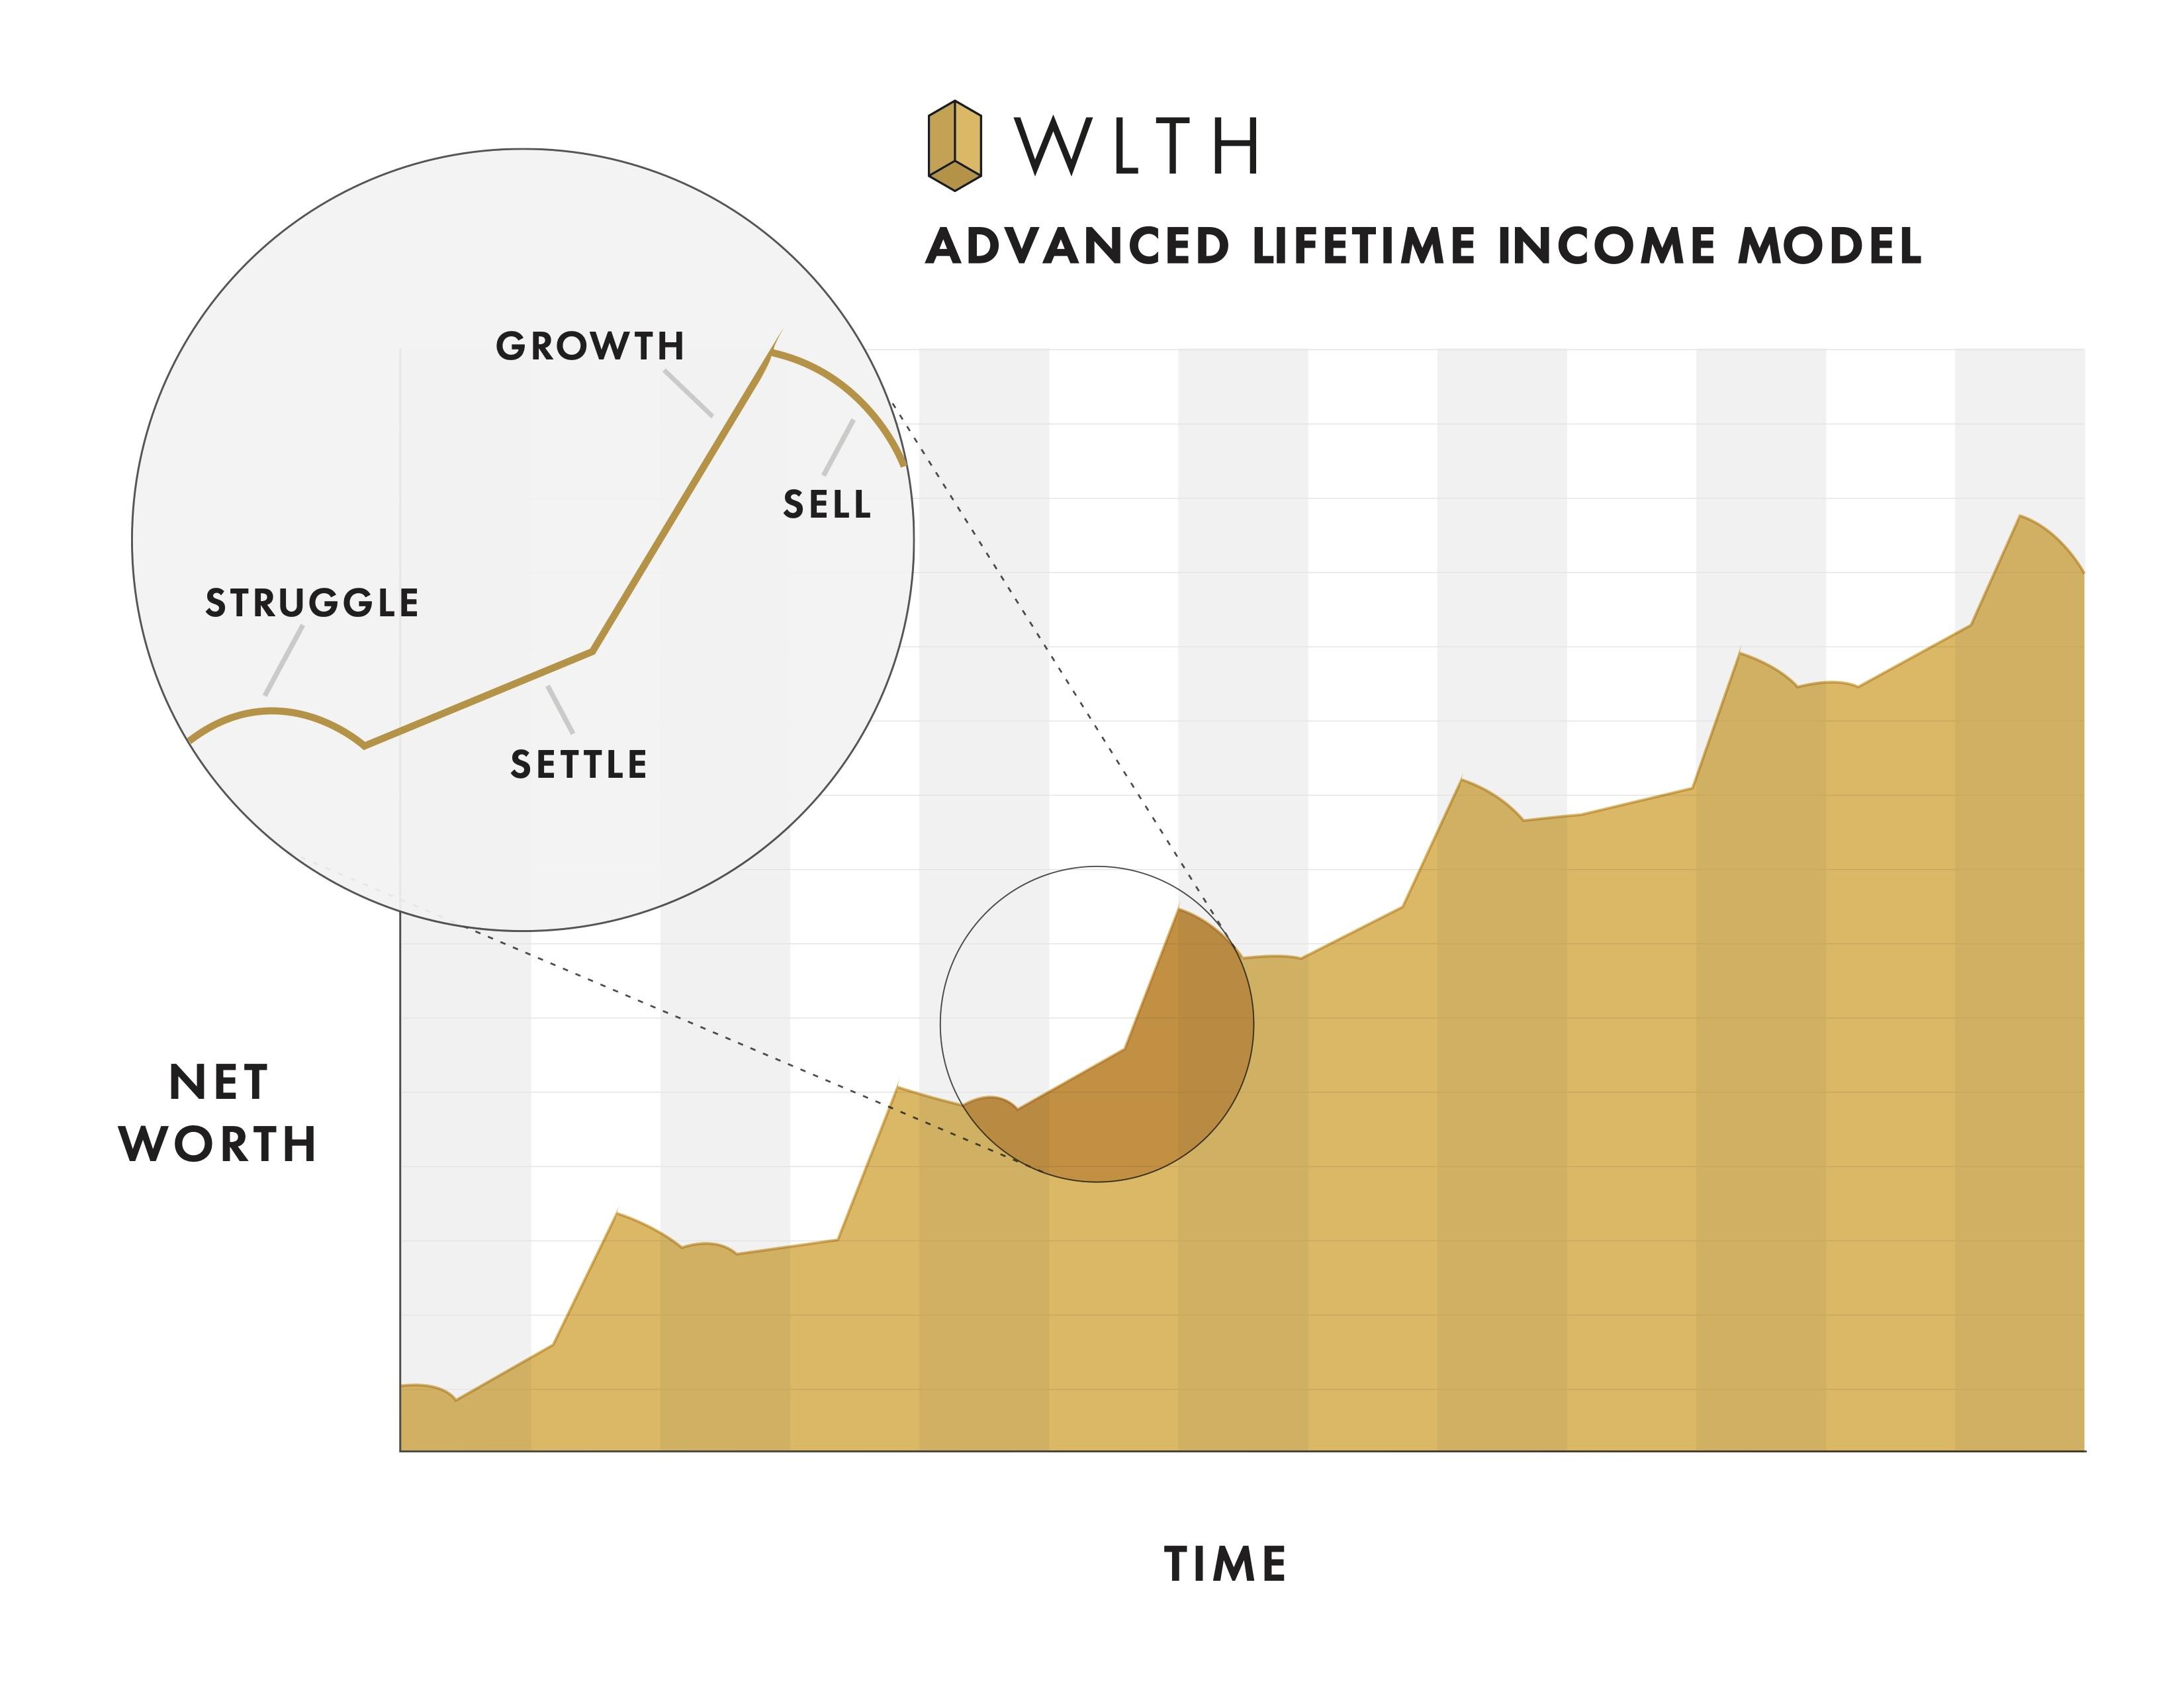 Advanced Lifetime Income Model